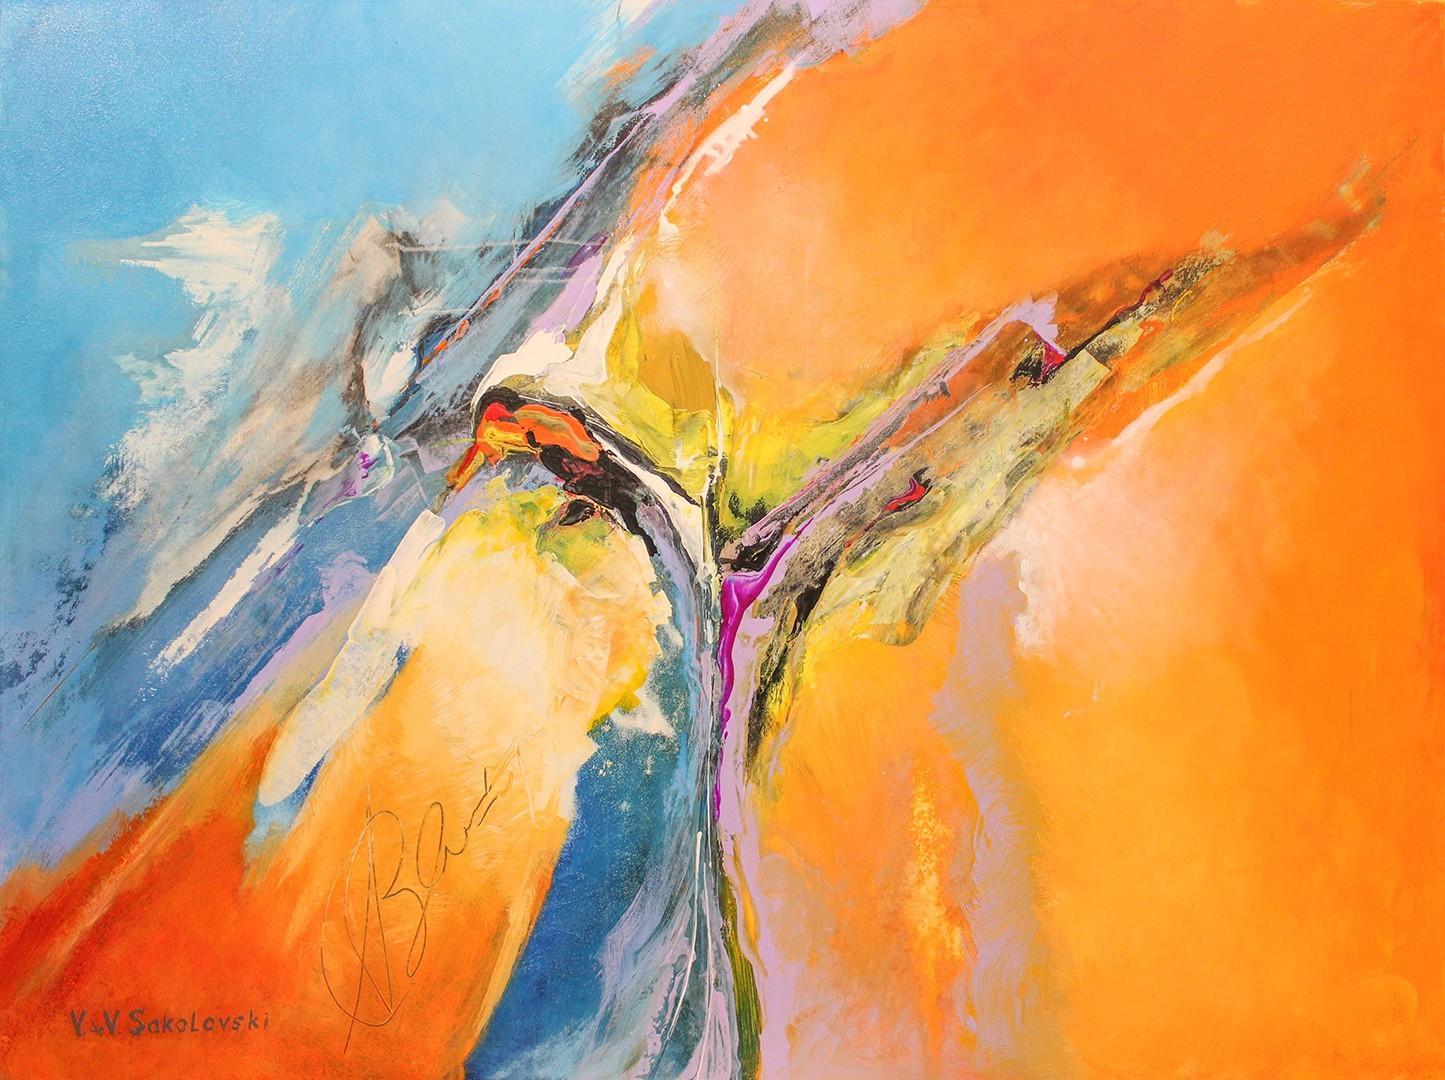 Dreamland Abstract Acrylic Painting 36x48 Valeri Sokolovski